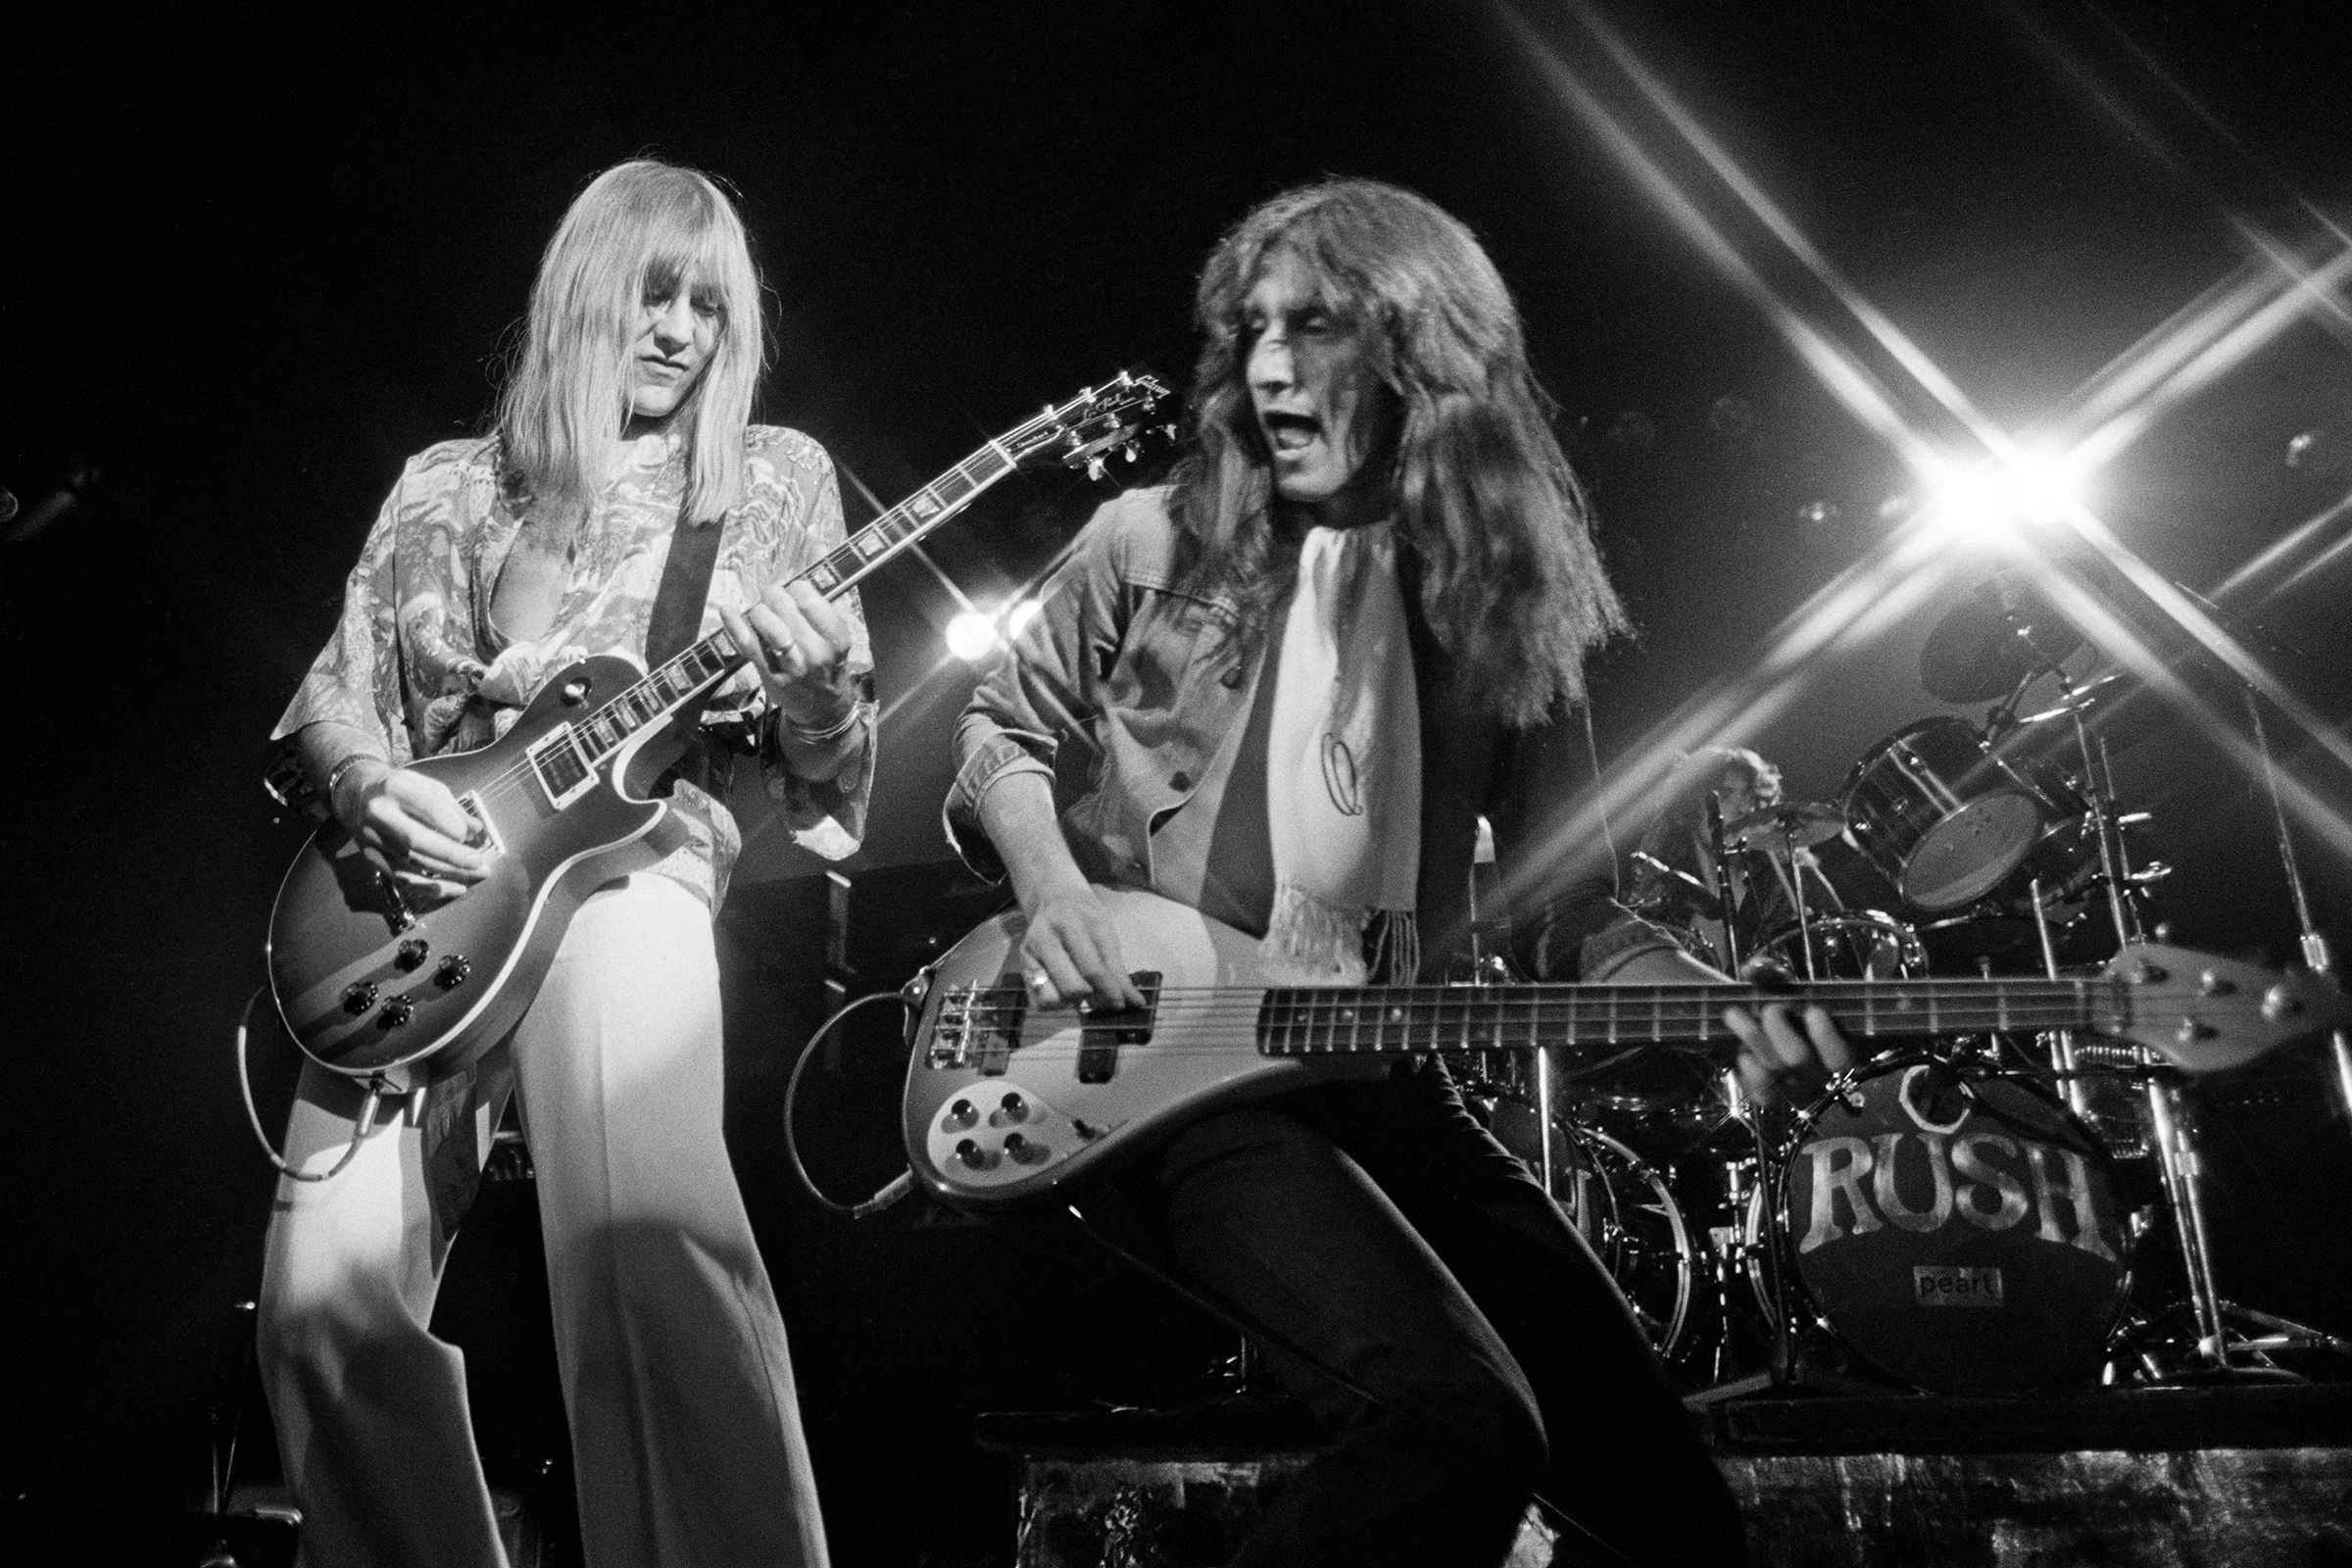 Flashback: Rush Tear Through 'Fly by Night' in 1976